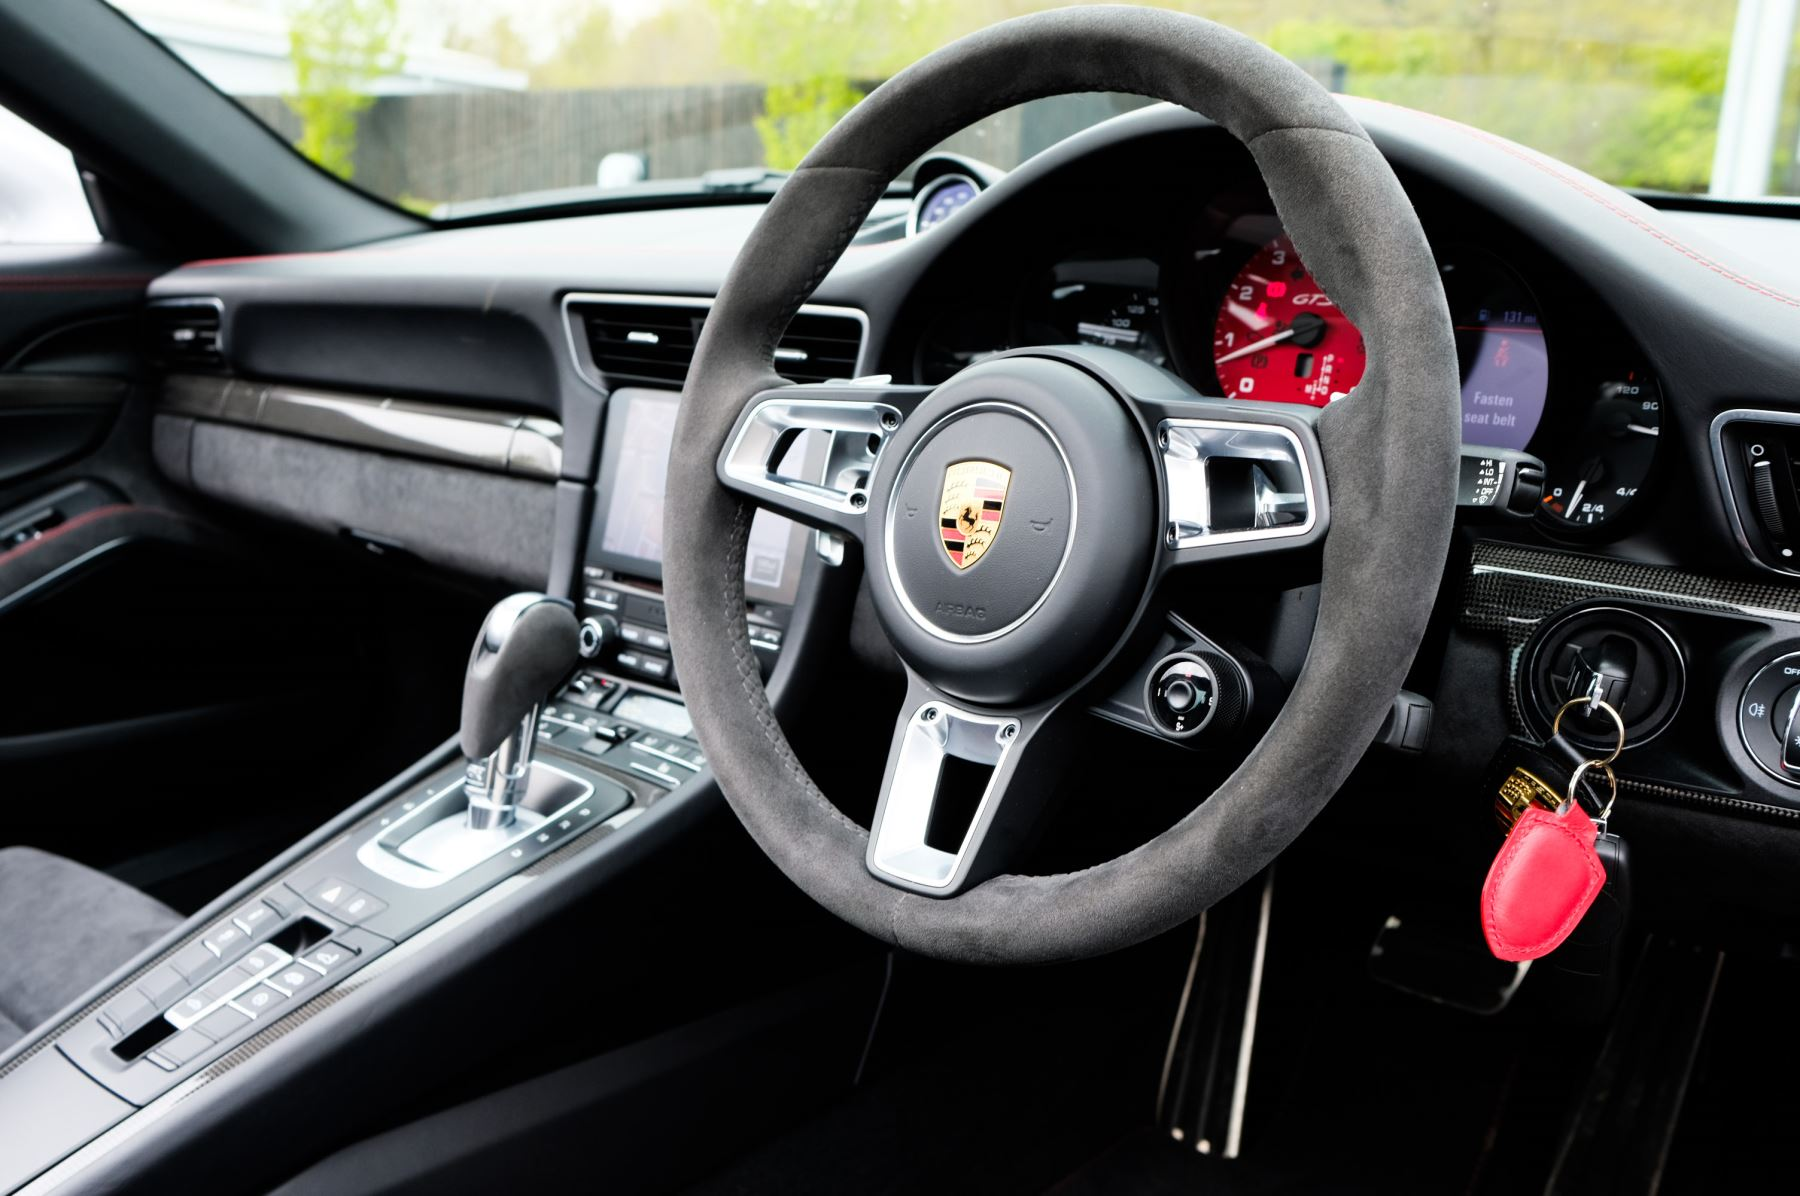 Porsche 911 TARGA 4 GTS - PDK - SPORT DESIGN PACKAGE - GTS INTERIOR PACKAGE image 19